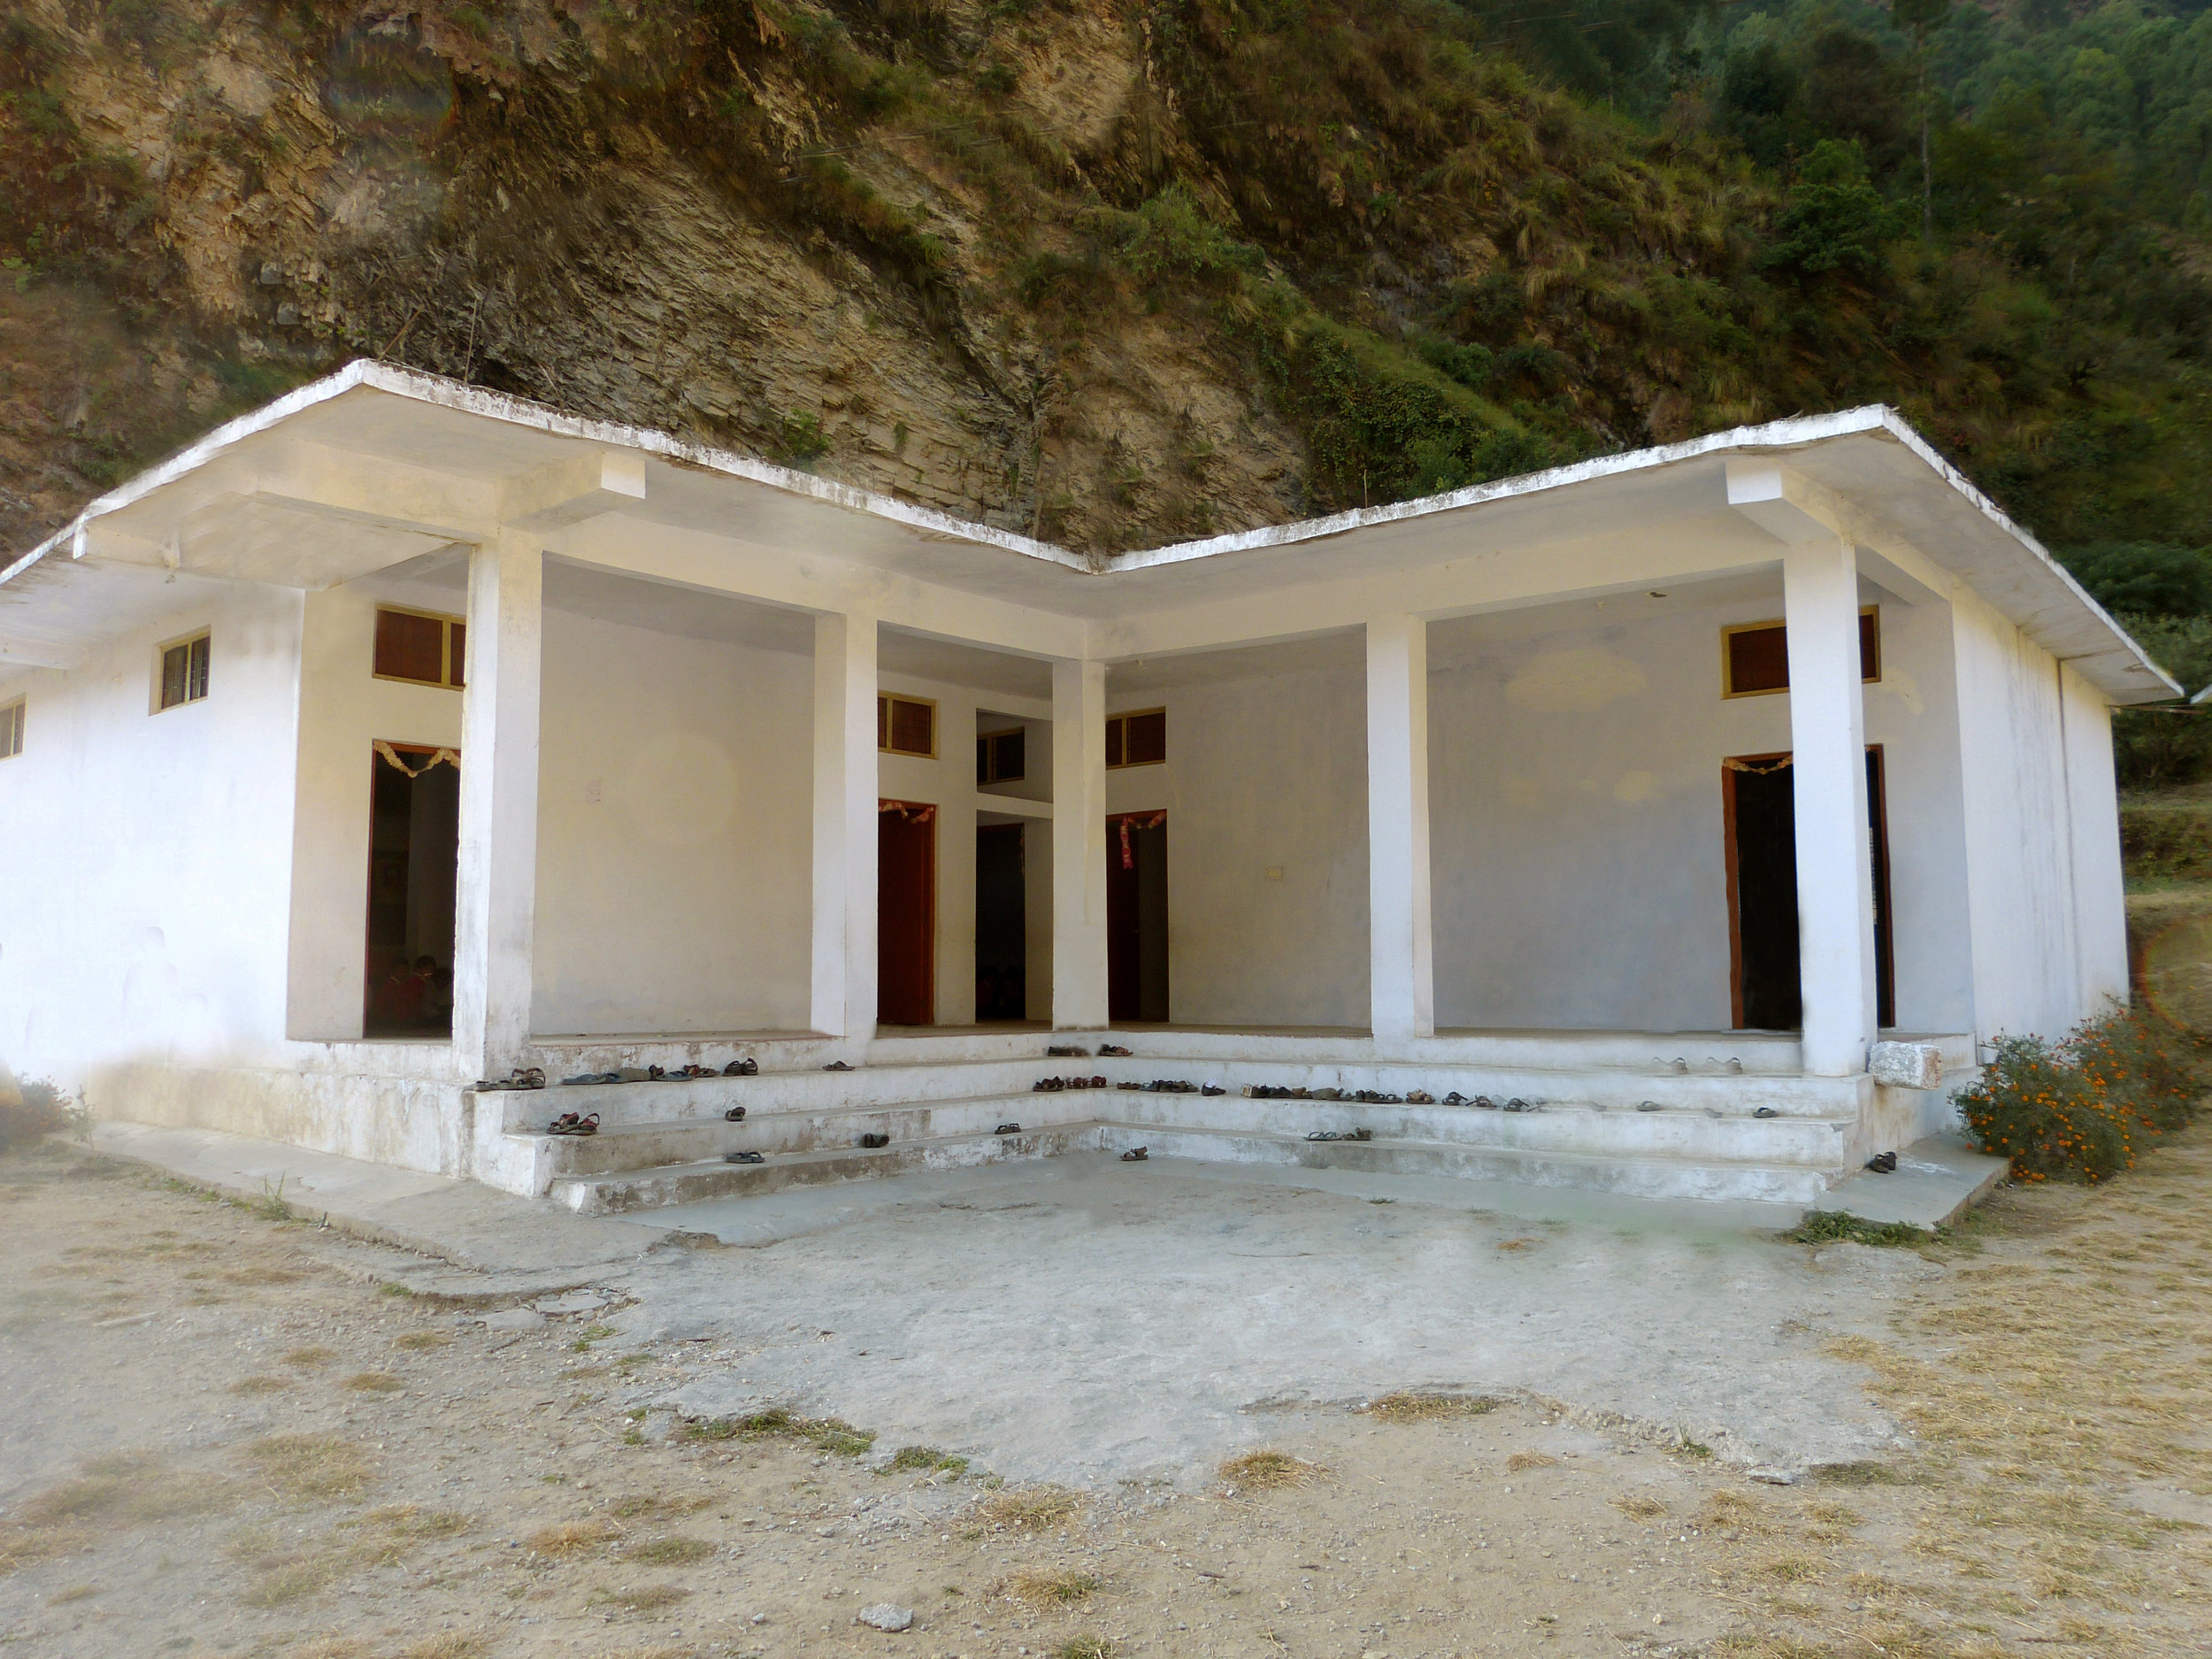 Saraswati Shishu Mandir Primary School, Uttrakhand - Funded by Mhairi Rodrigues and Friends